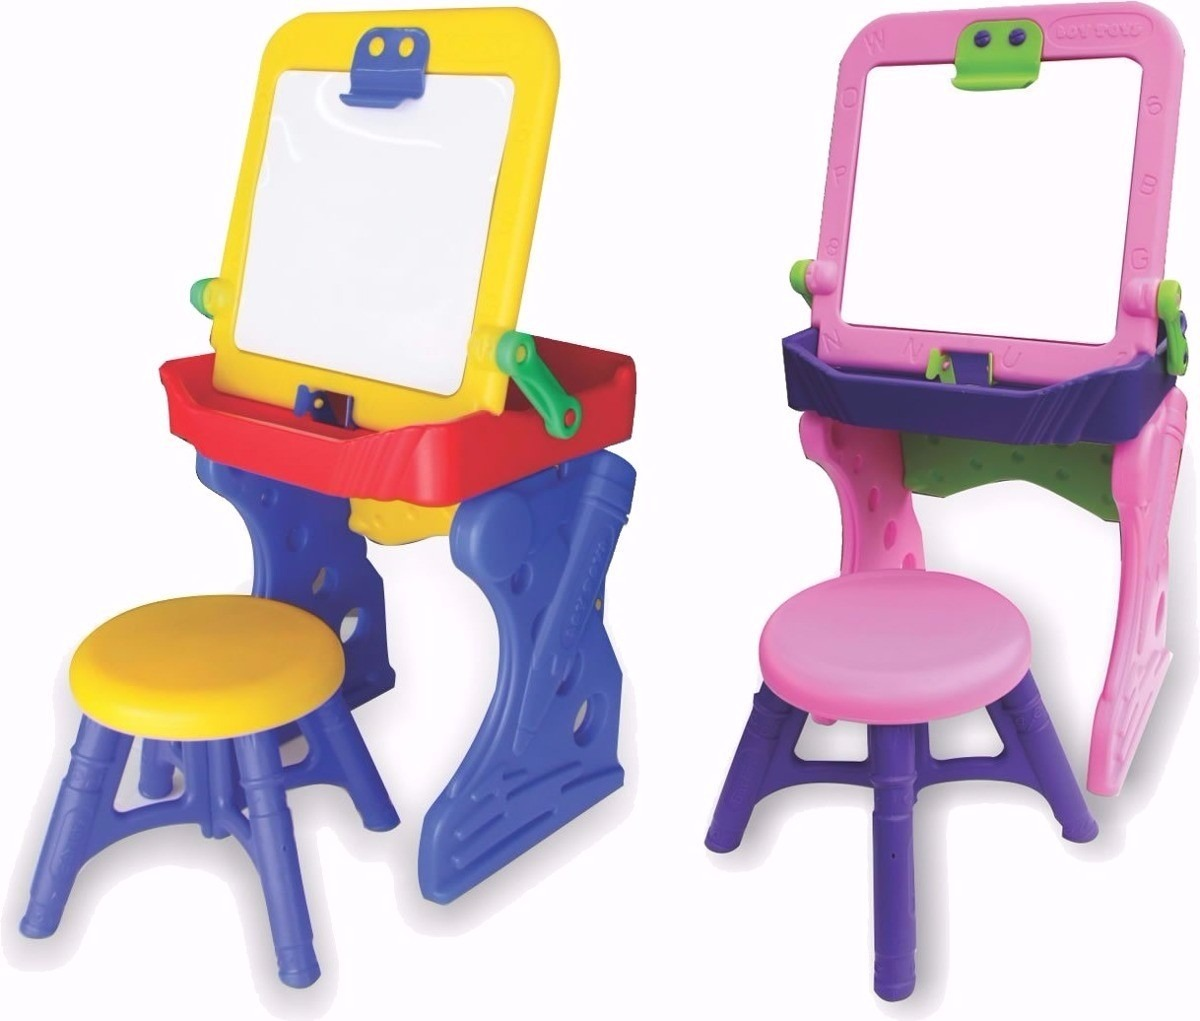 Mesa escritorio tablero acrilico infantil mesa silla - Tablero escritorio ...